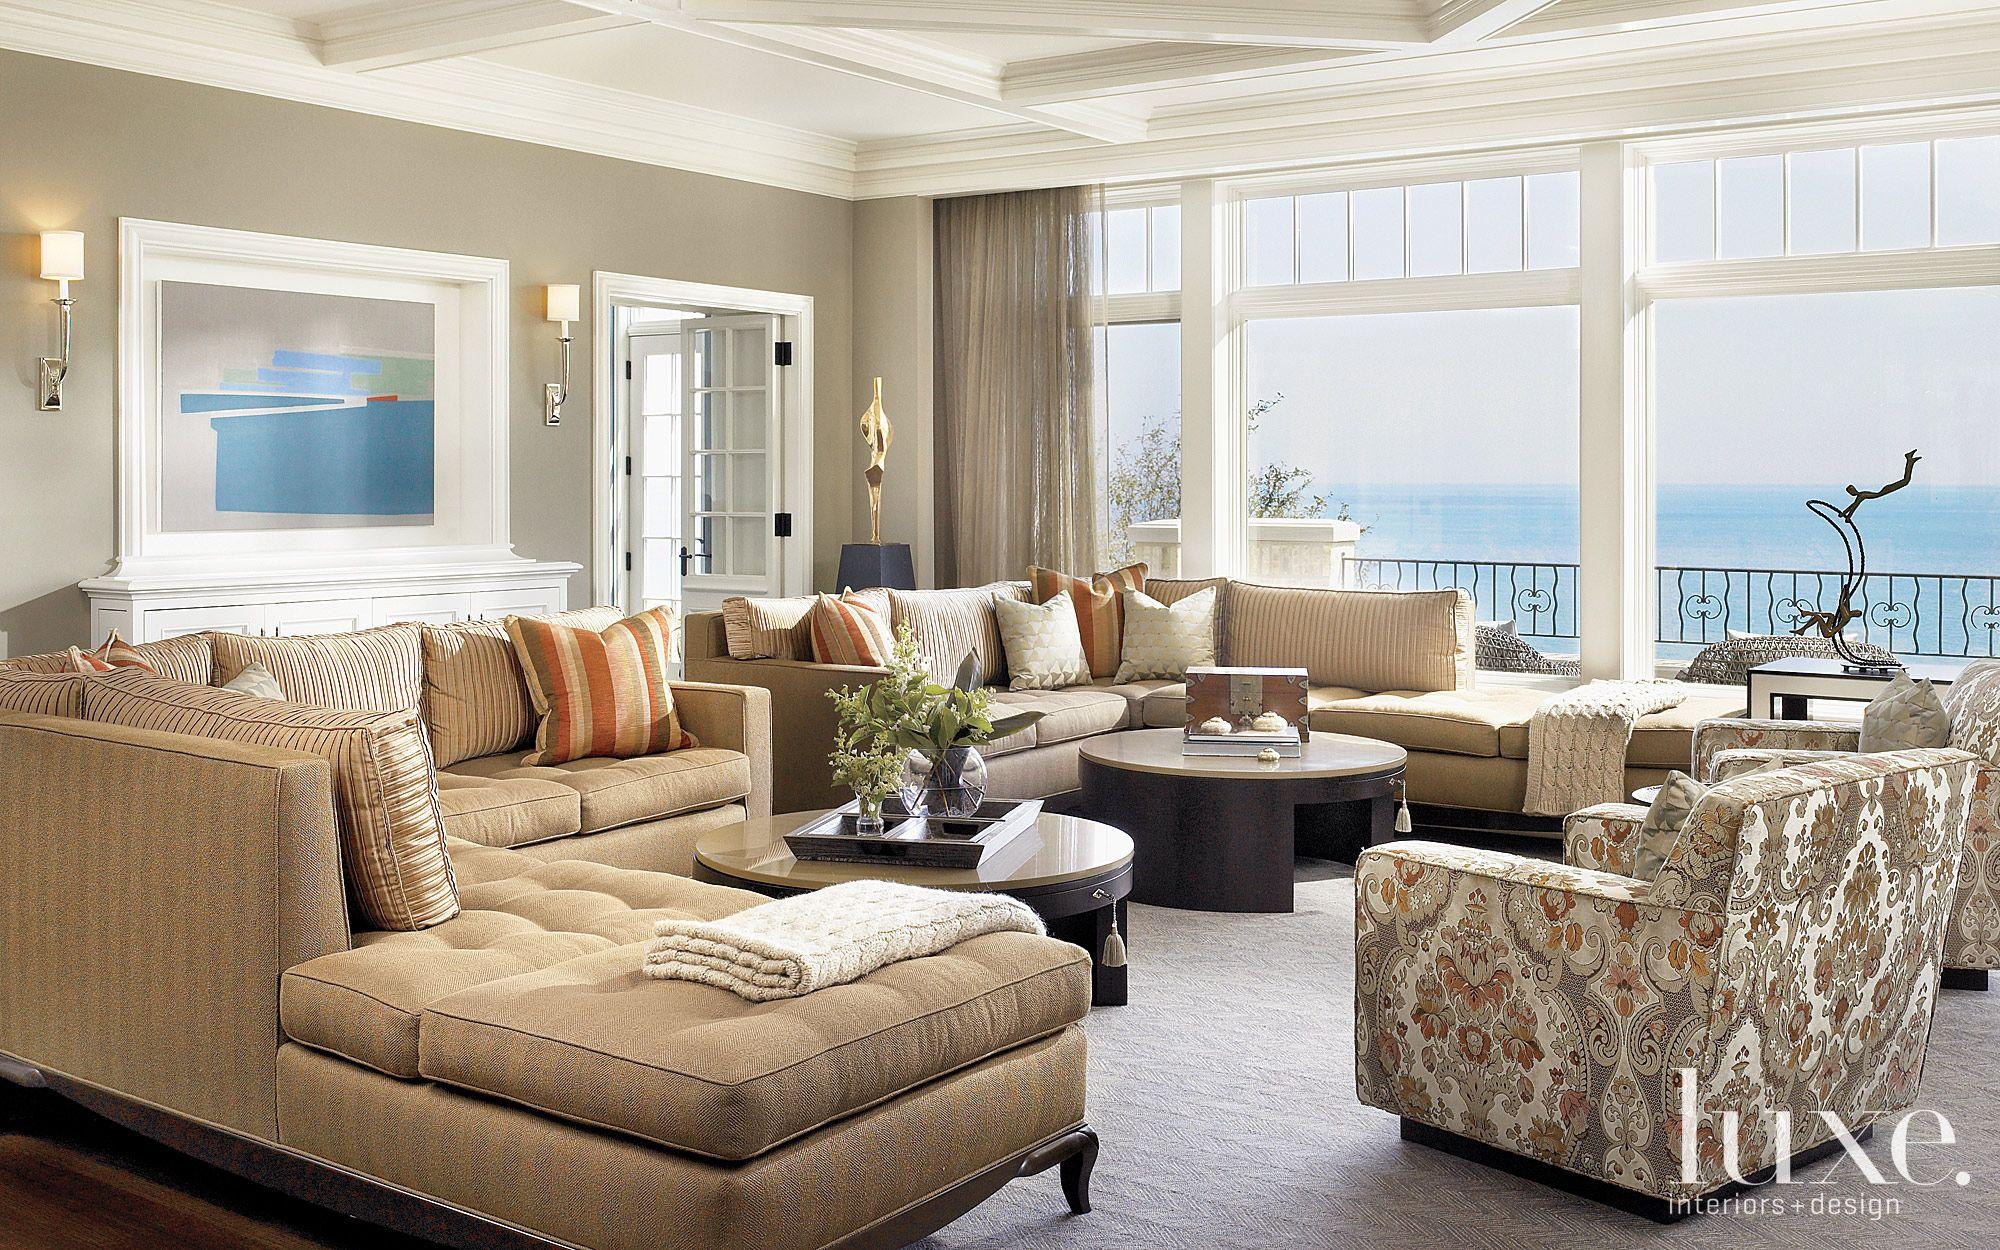 Contemporary Cream Living Room with Lake Views